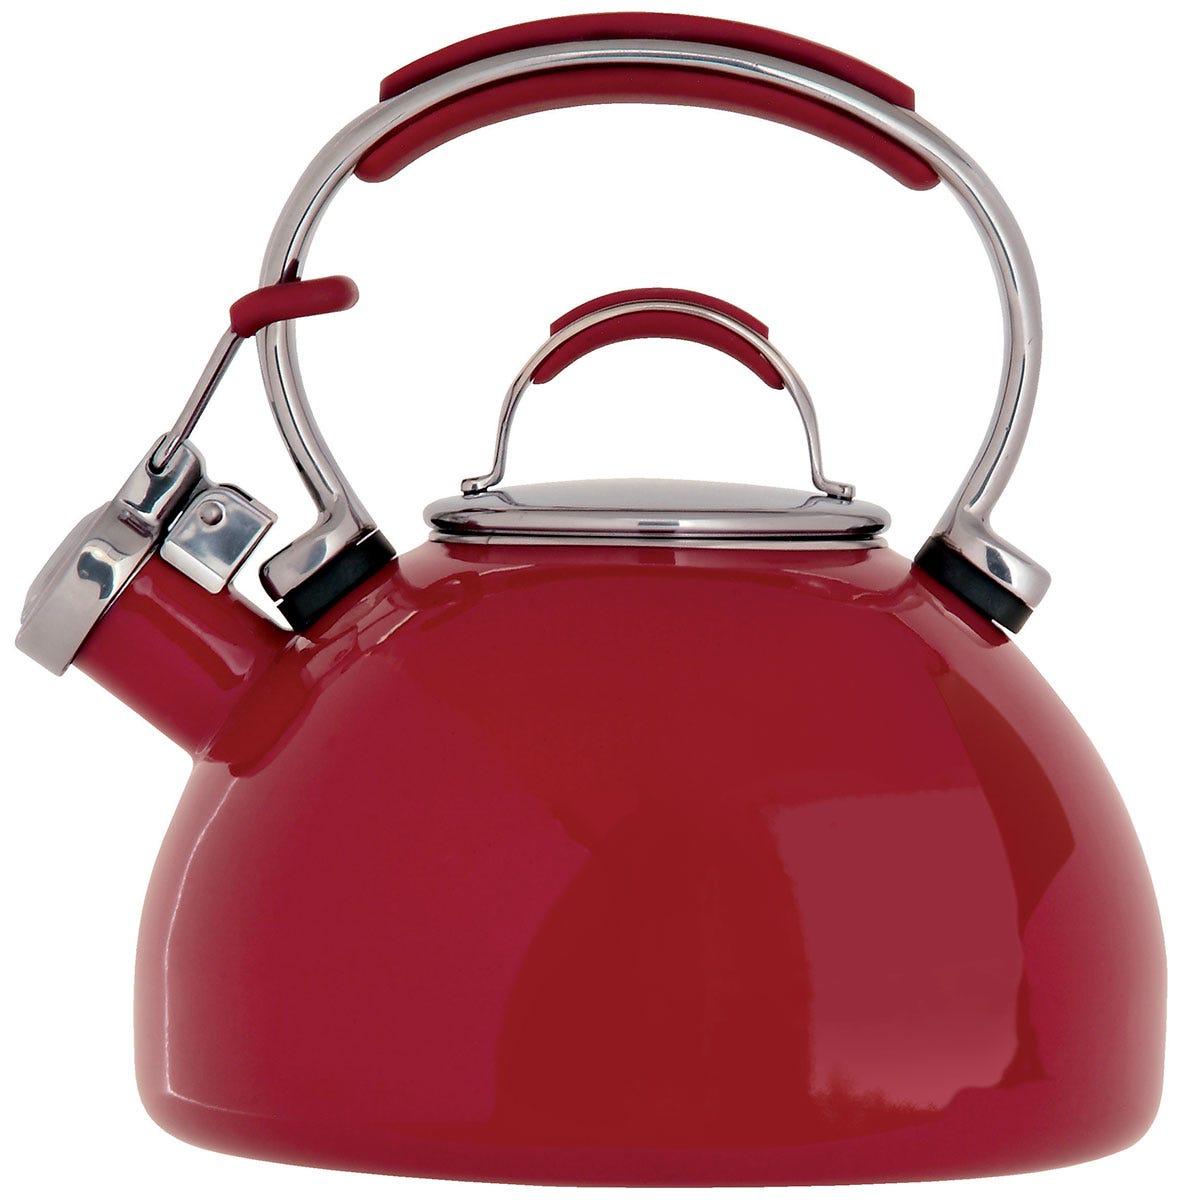 Prestige Red Stove Top Kettle - 2L